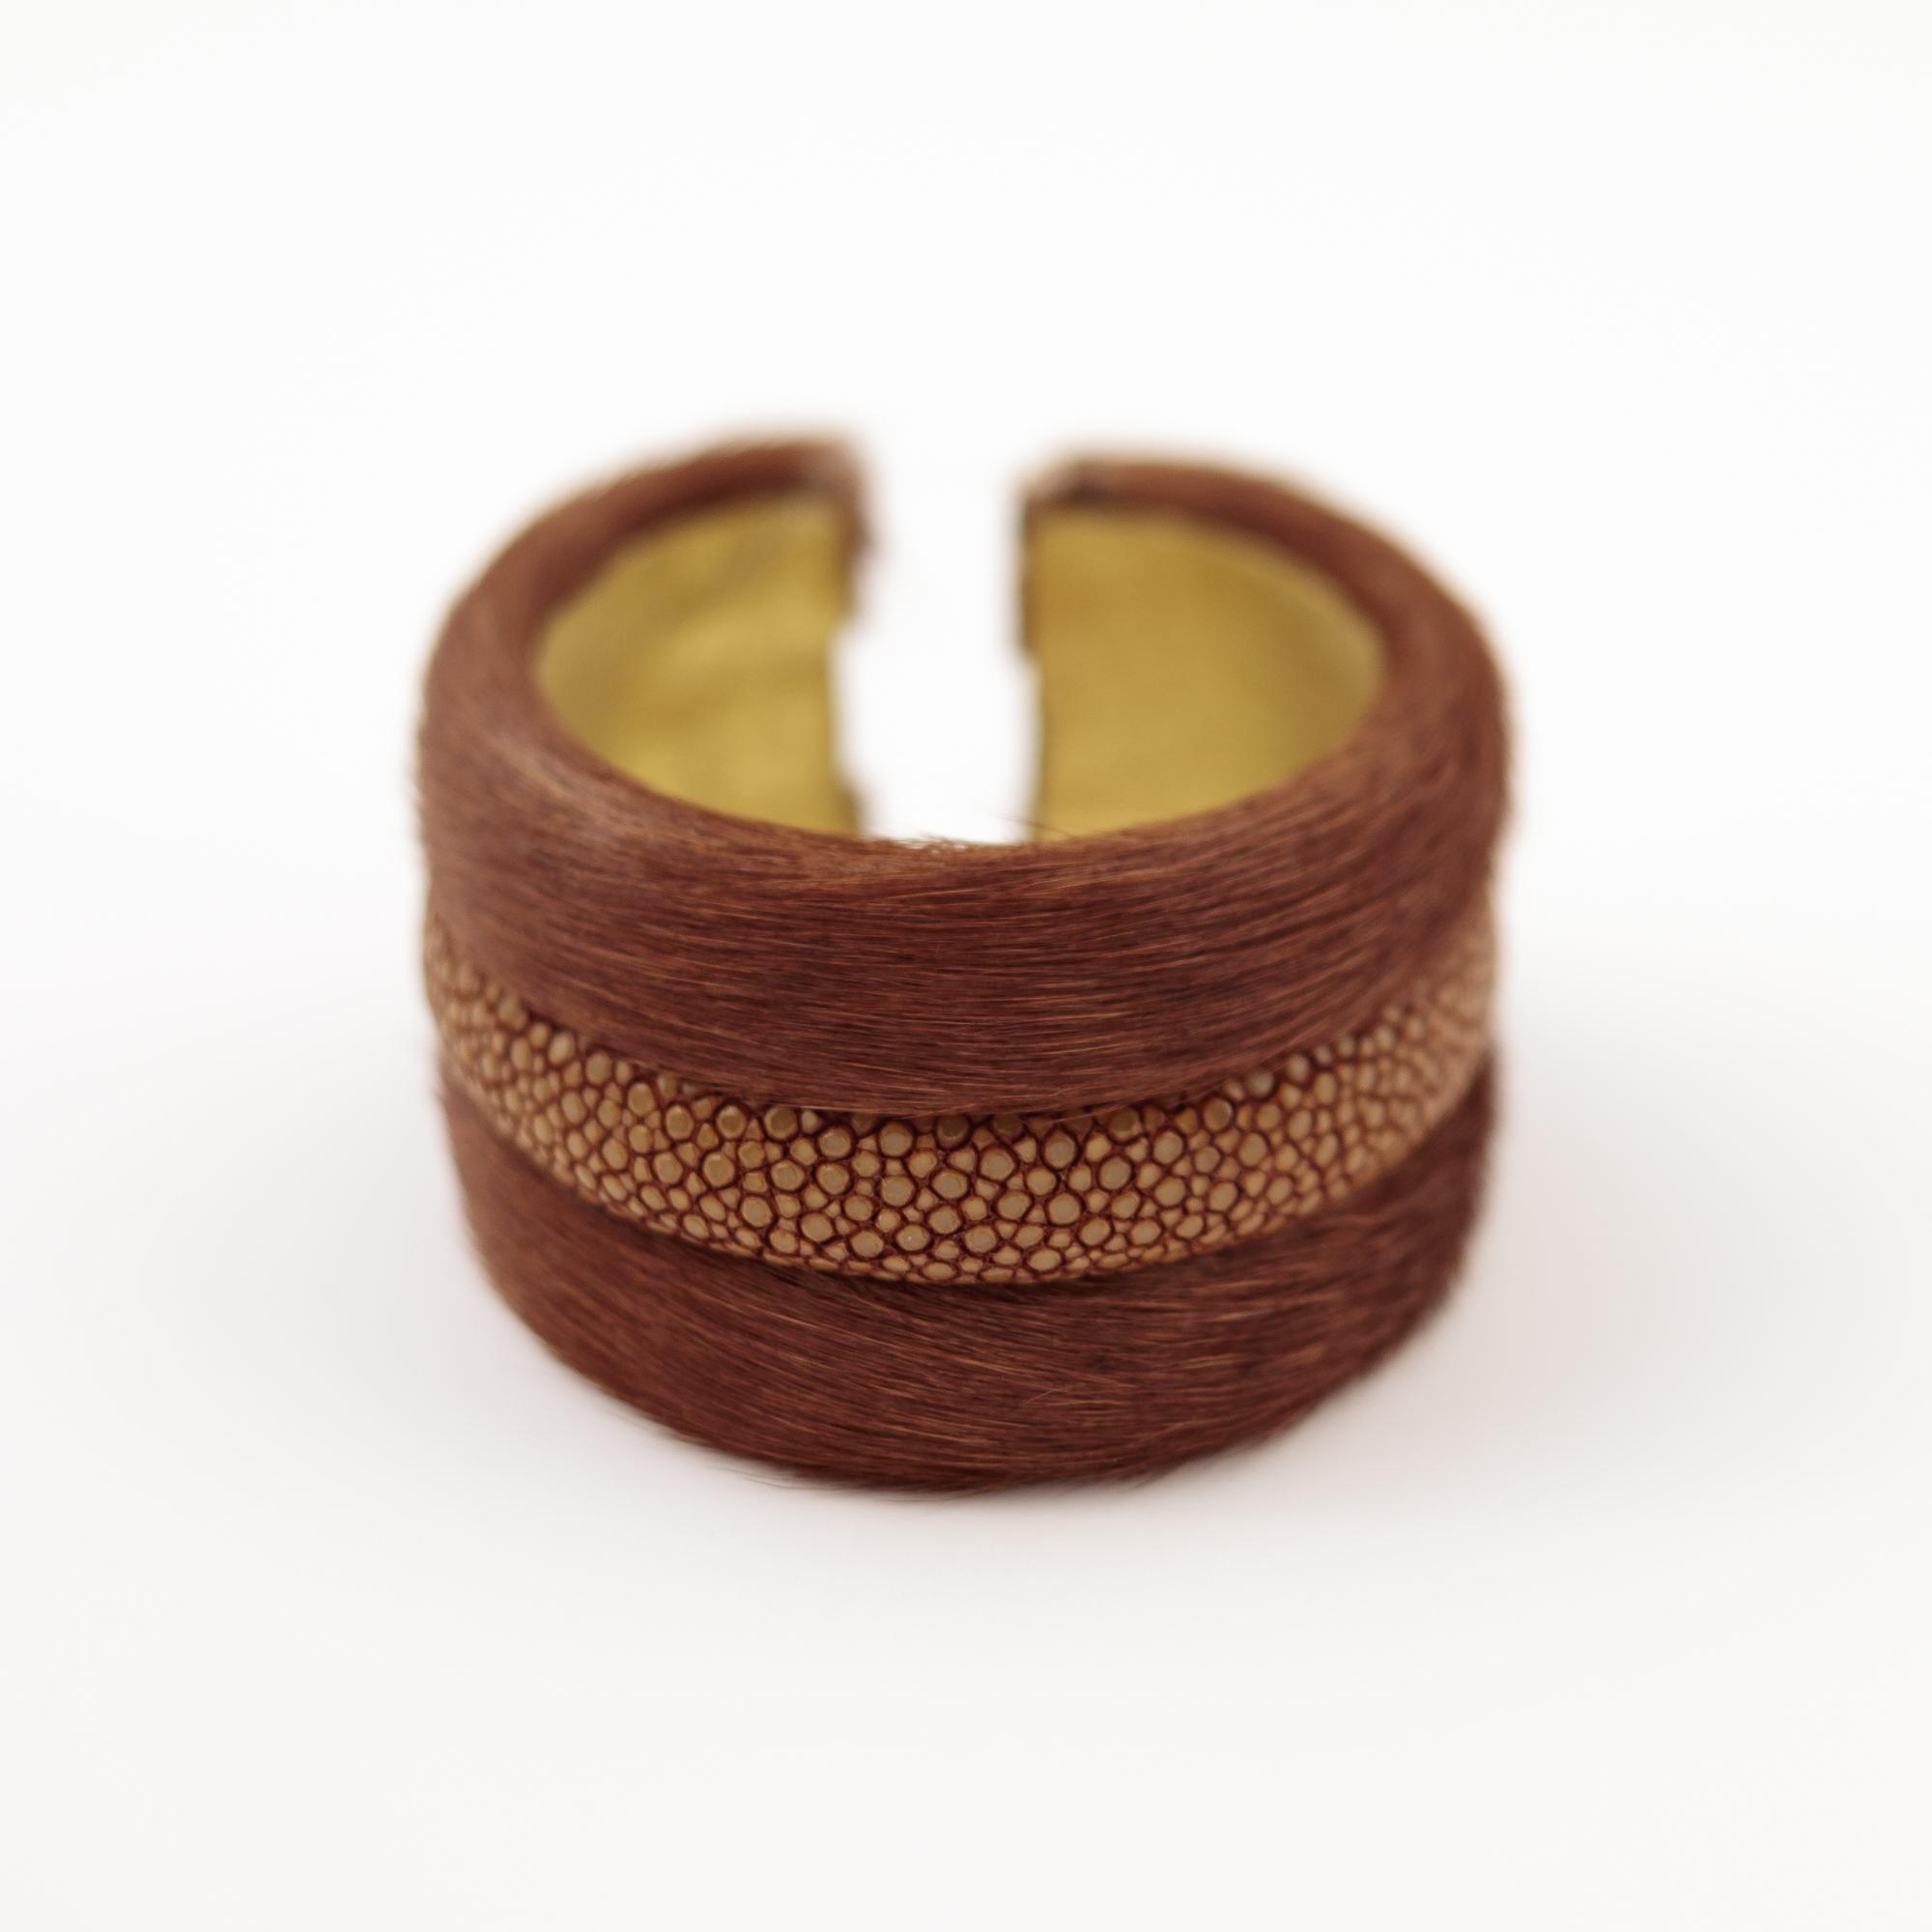 tresor-by-flore-galuchat-bracelet-poilu-marron-moutarde